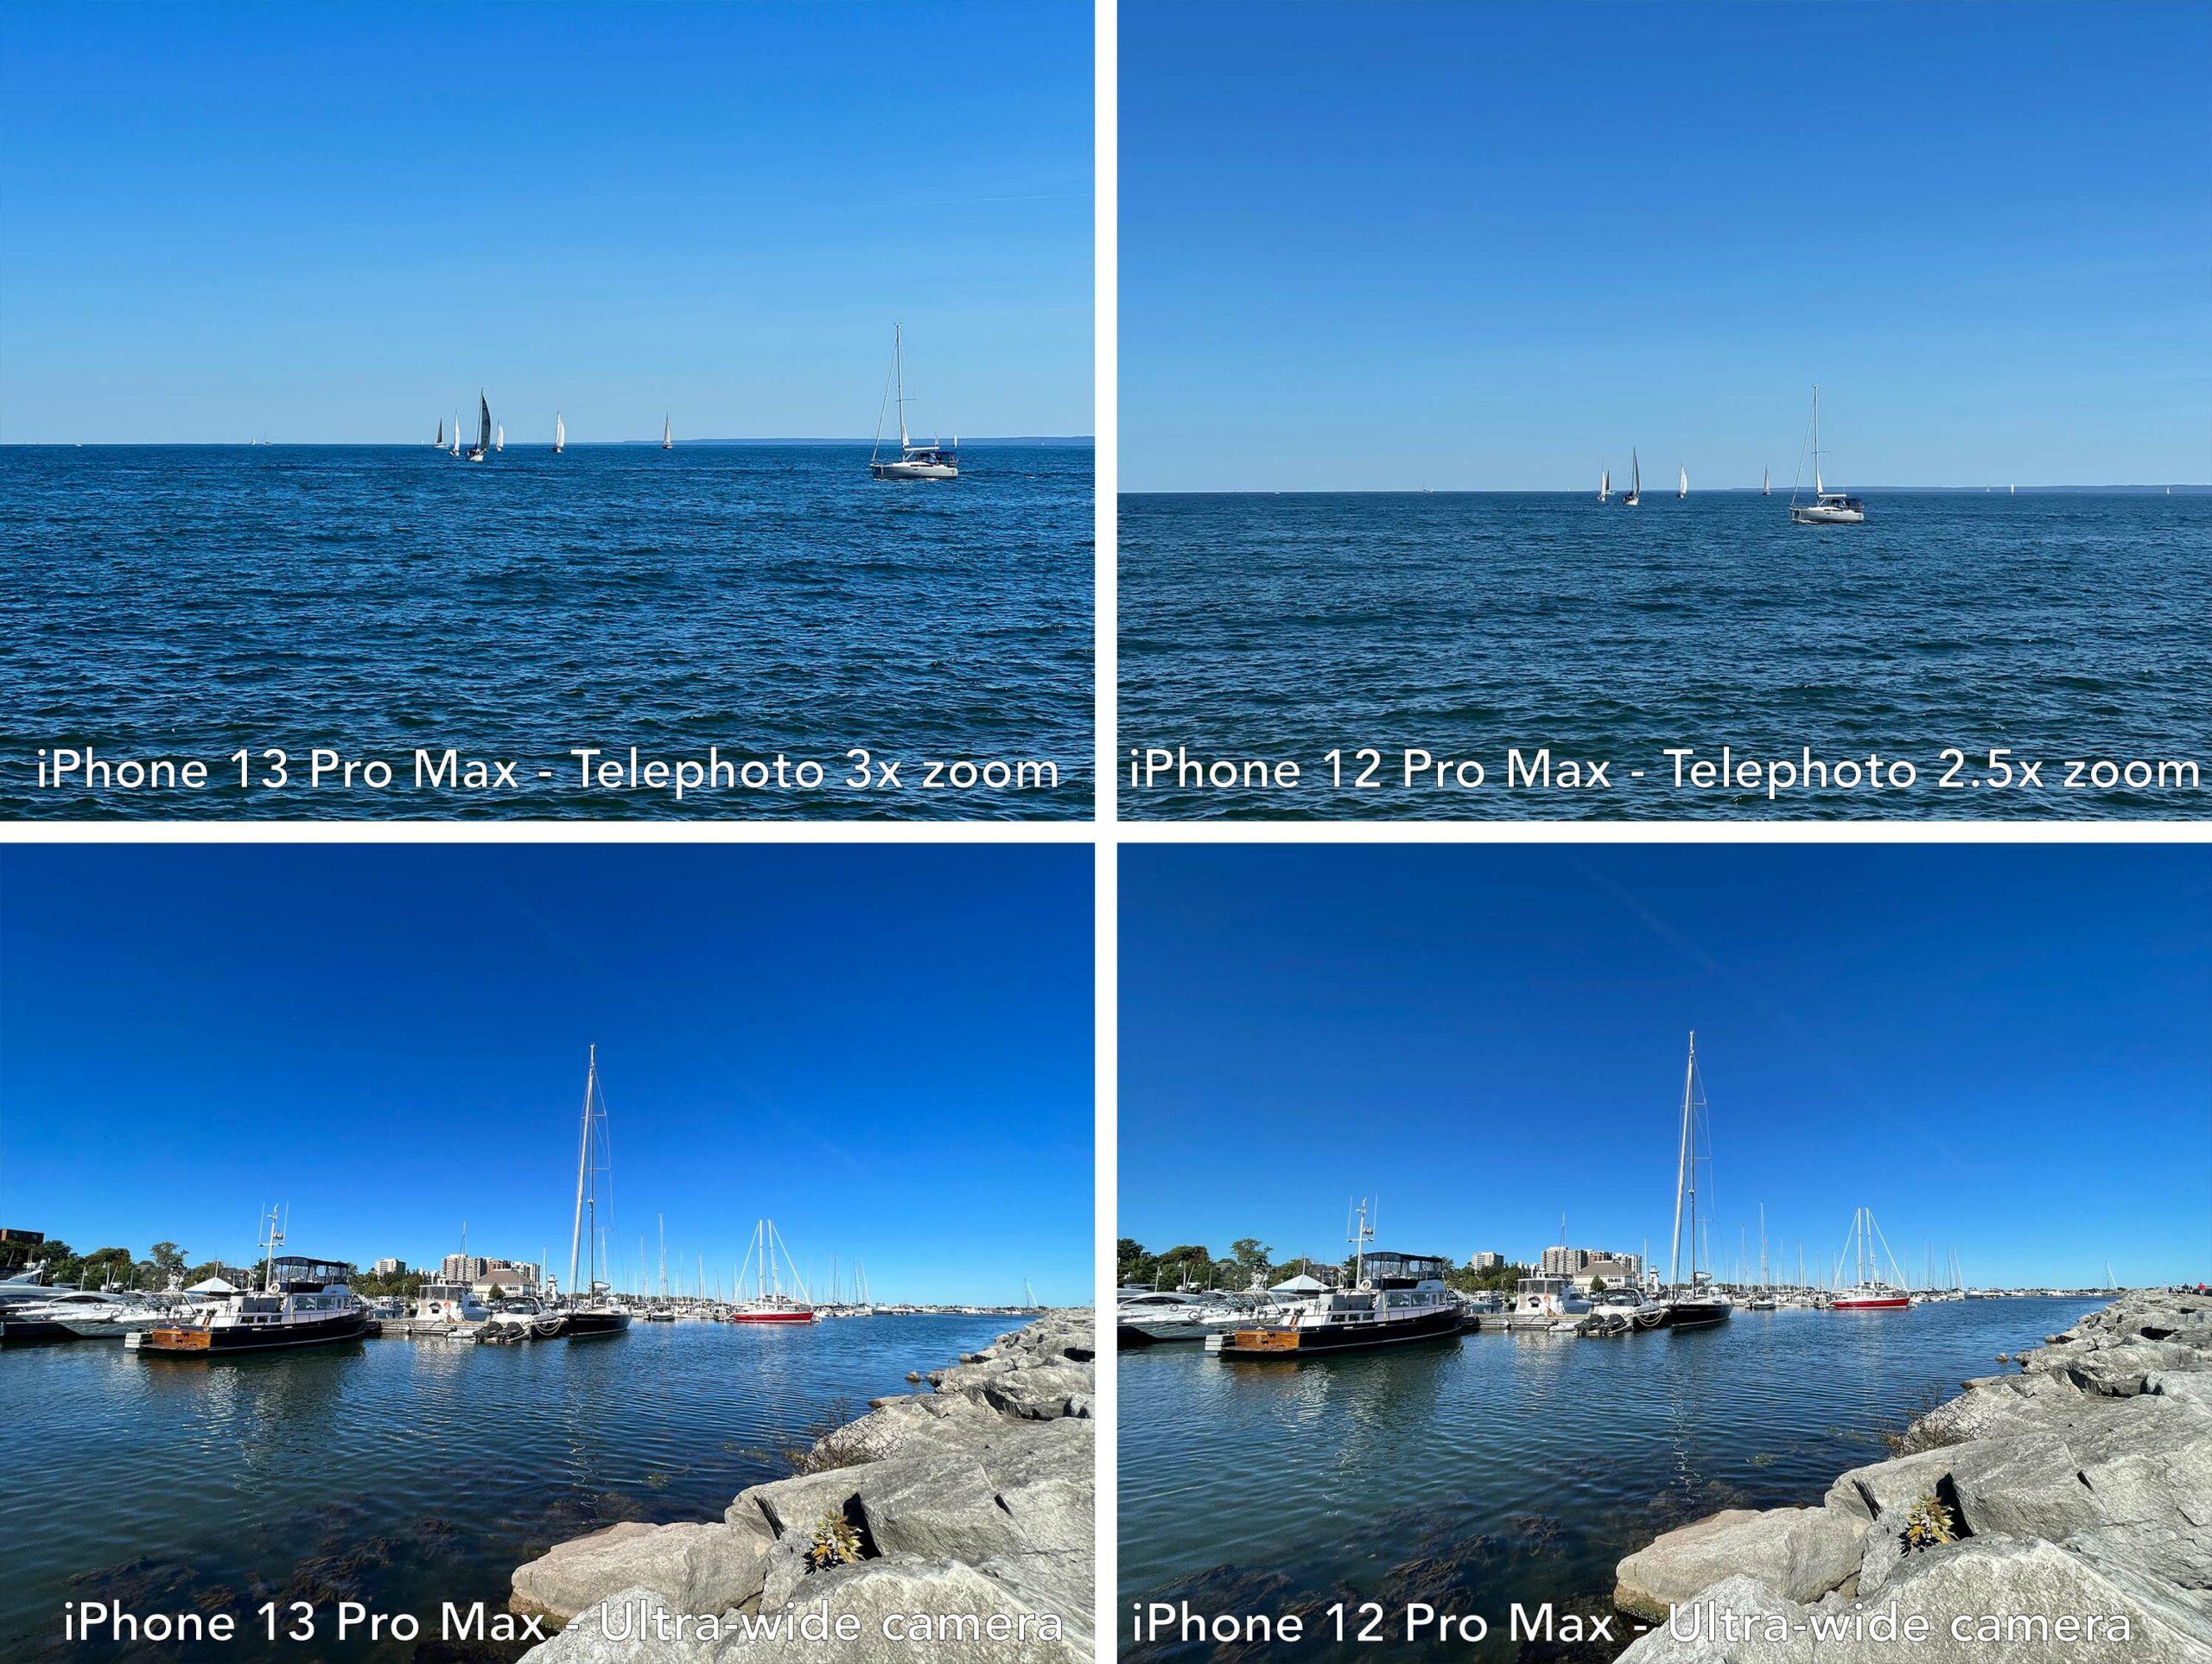 iPhone 13 Pro vs iPhone 12 Pro zoom comparison